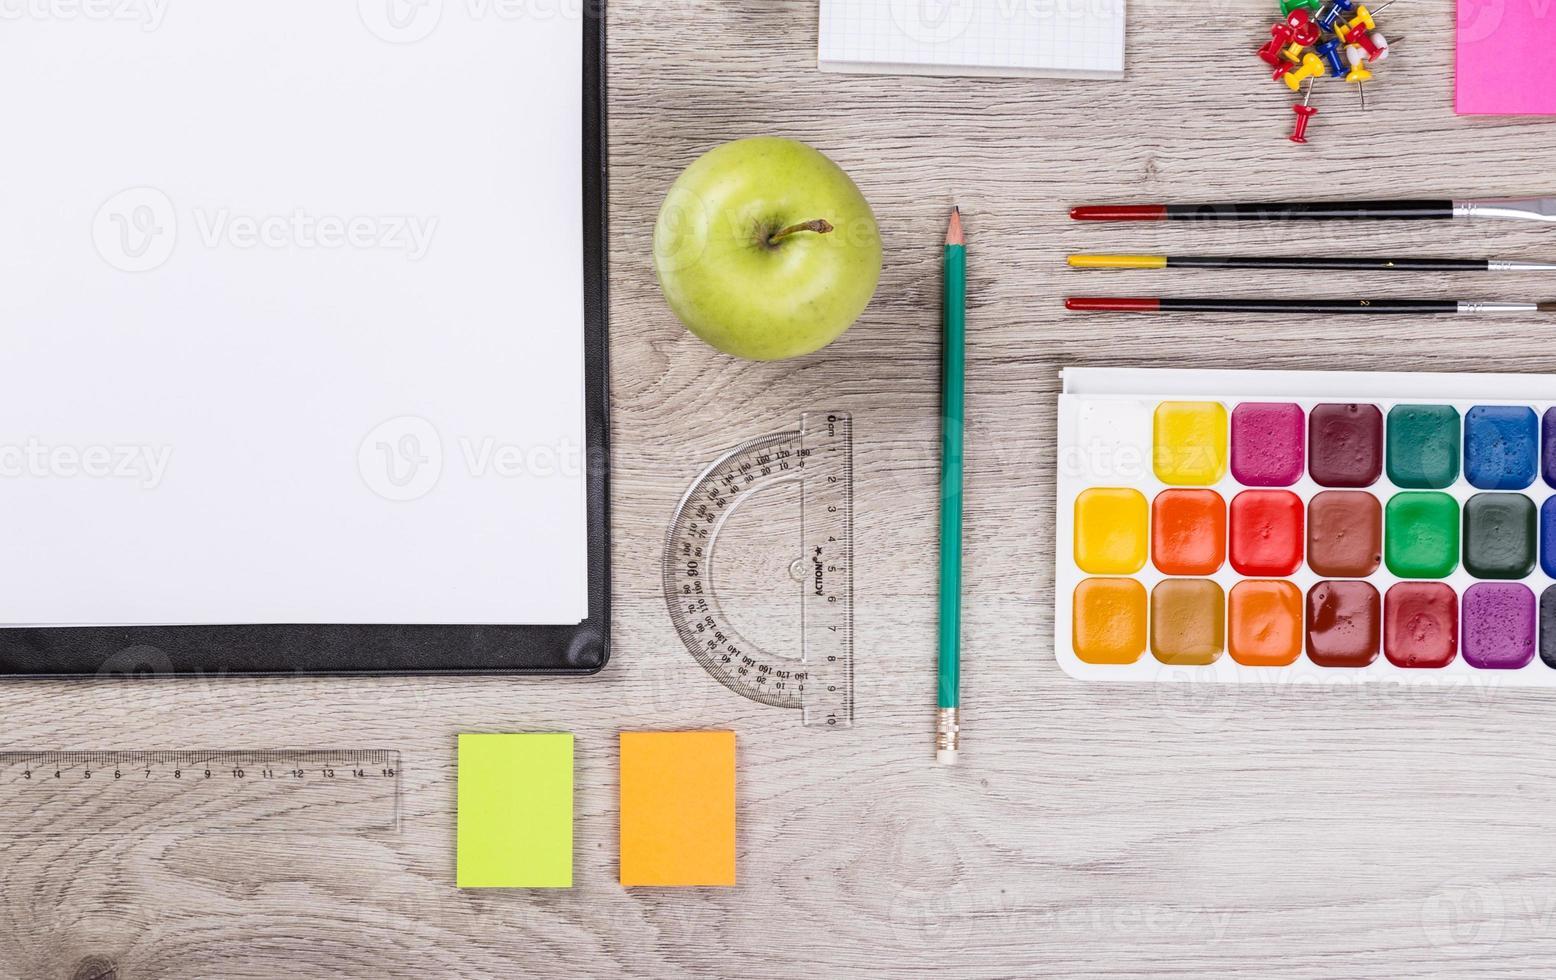 papier, potloden, penseel, groene appel op houten tafel foto